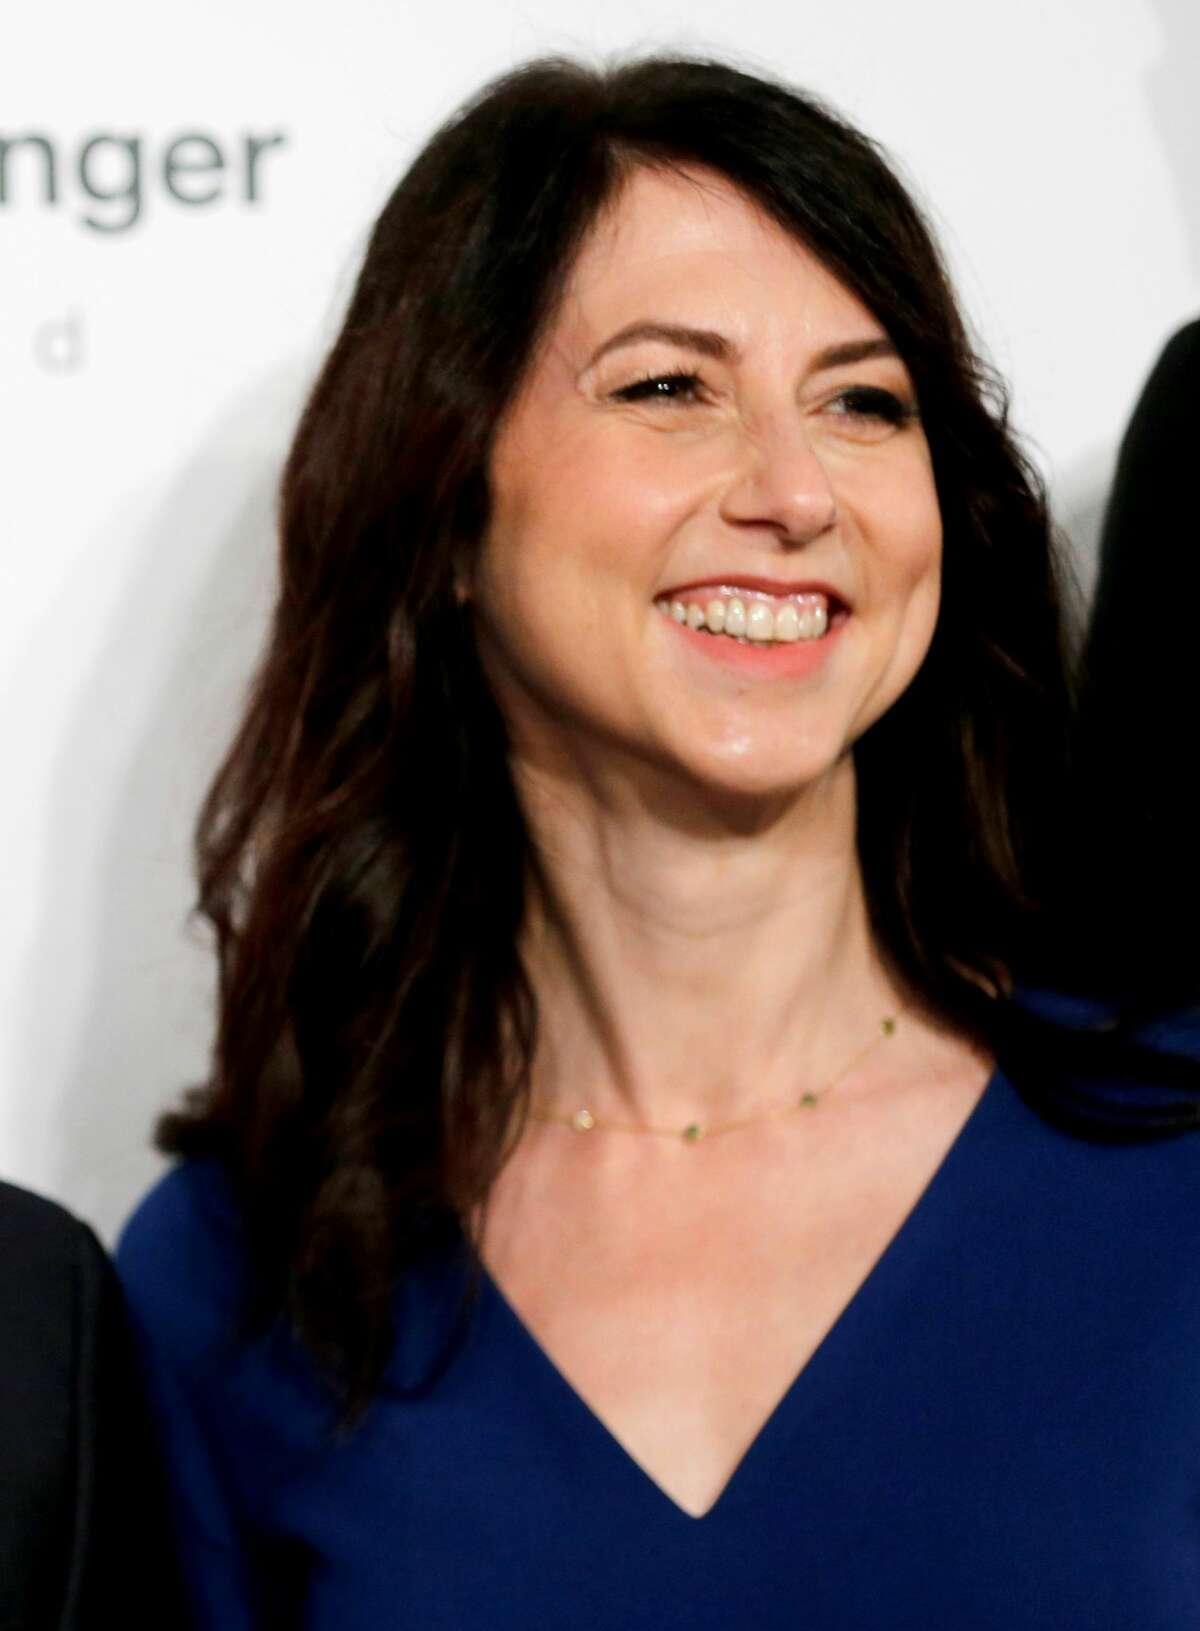 MacKenzie Scott, ex-wife to Jeff Bezos, CEO of Amazon, donated an estimated $160 million to HBCU's and HBCU advocacy organizations